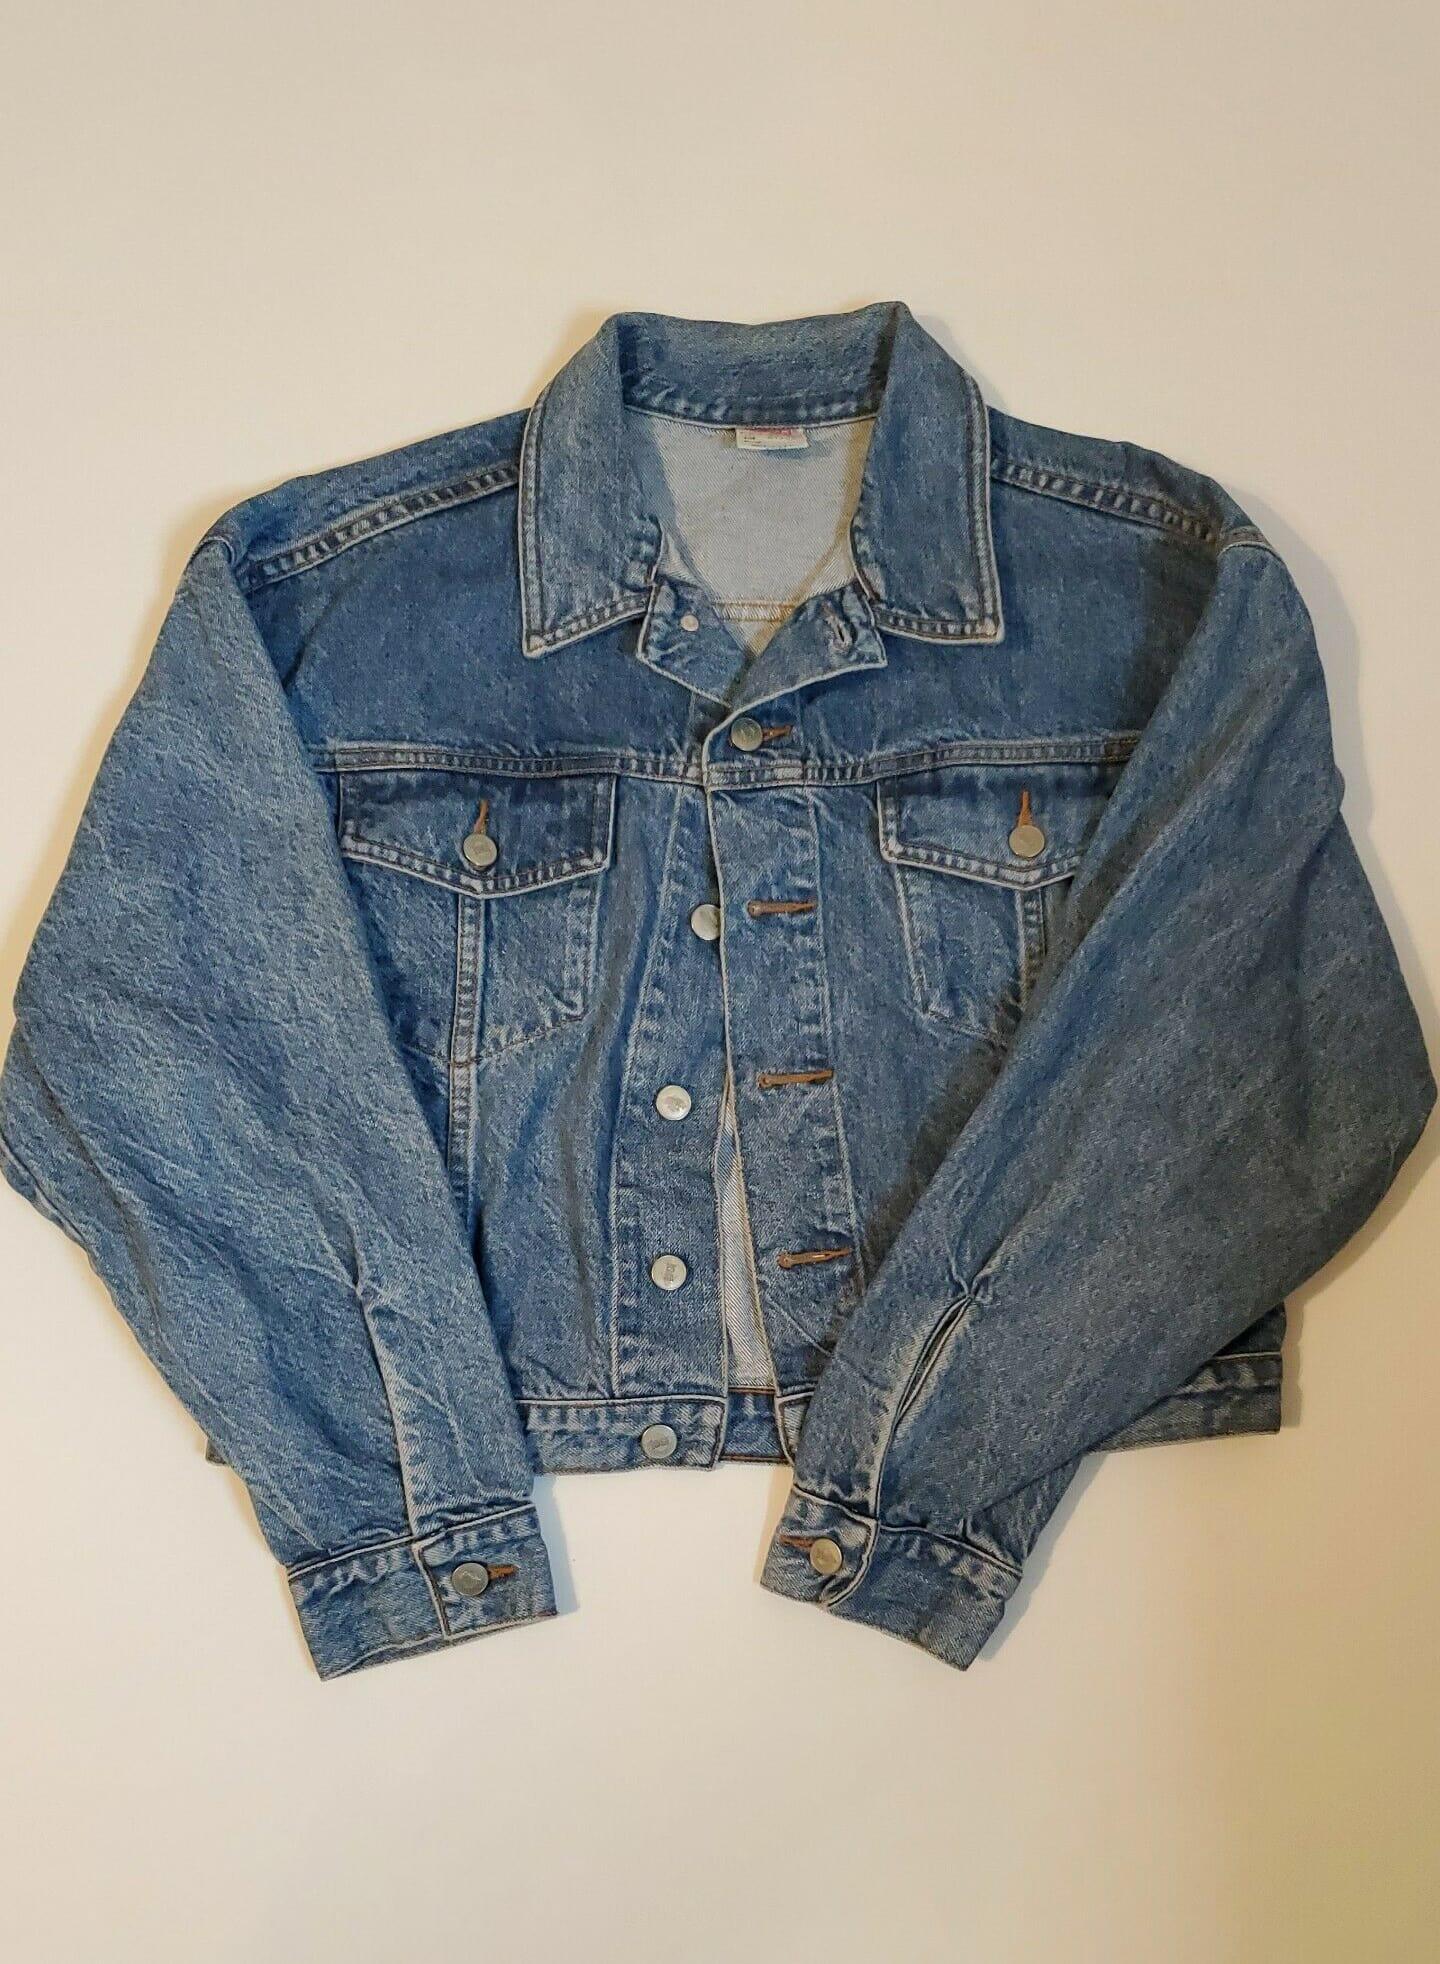 Vintage USA Bongo Medium Wash Denim Button Front Jean Jacket Made in USA - Large